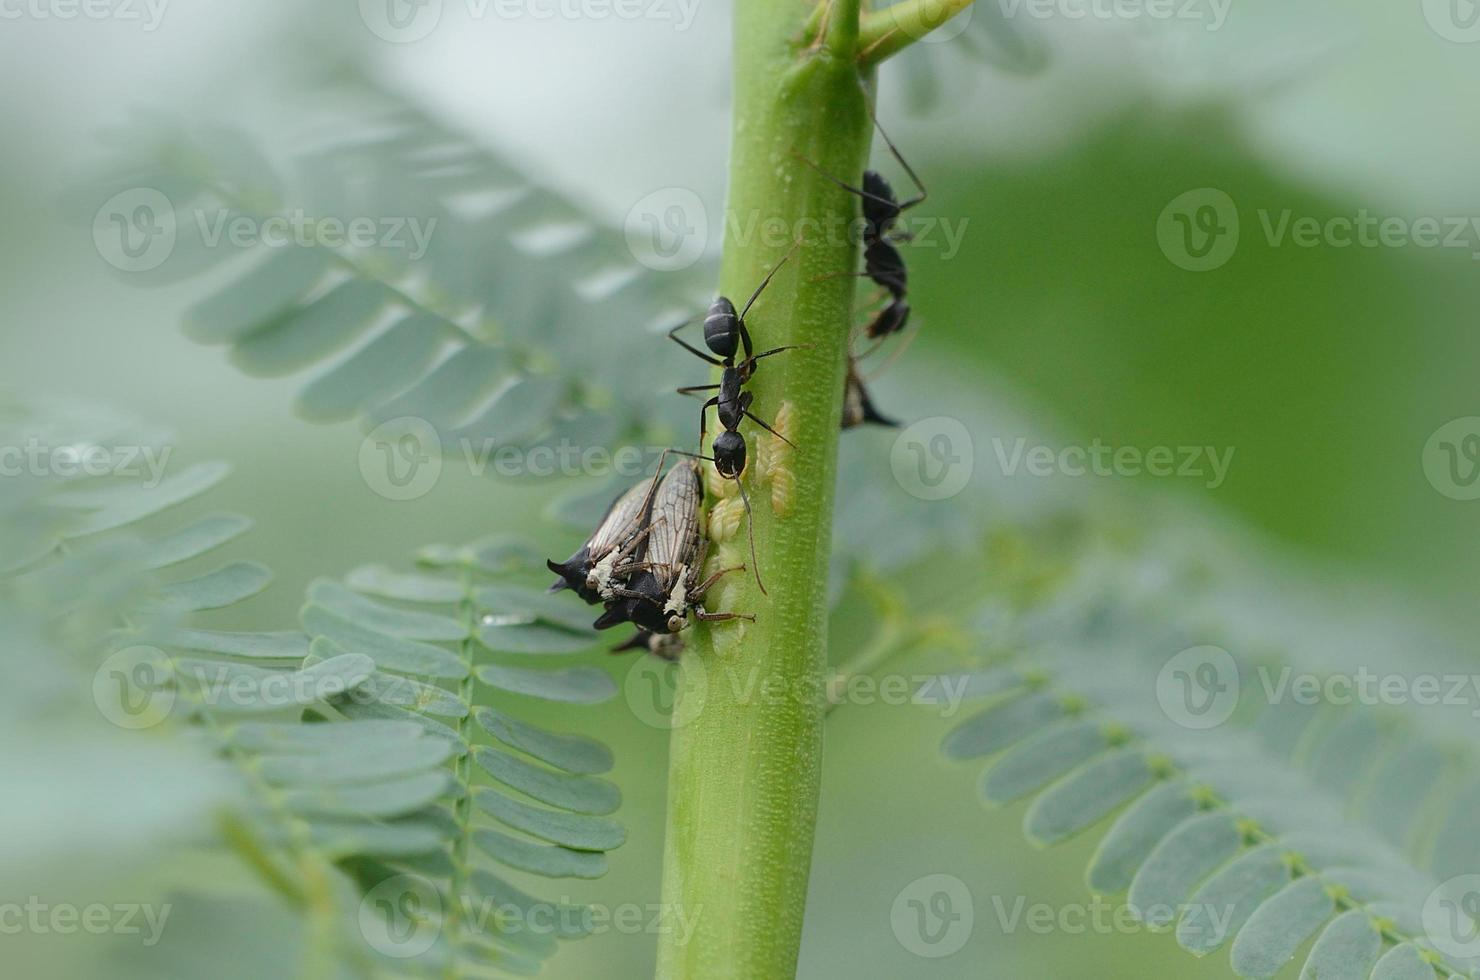 schwarze Ameise & Centrotus cornutus (Hemiptera) foto